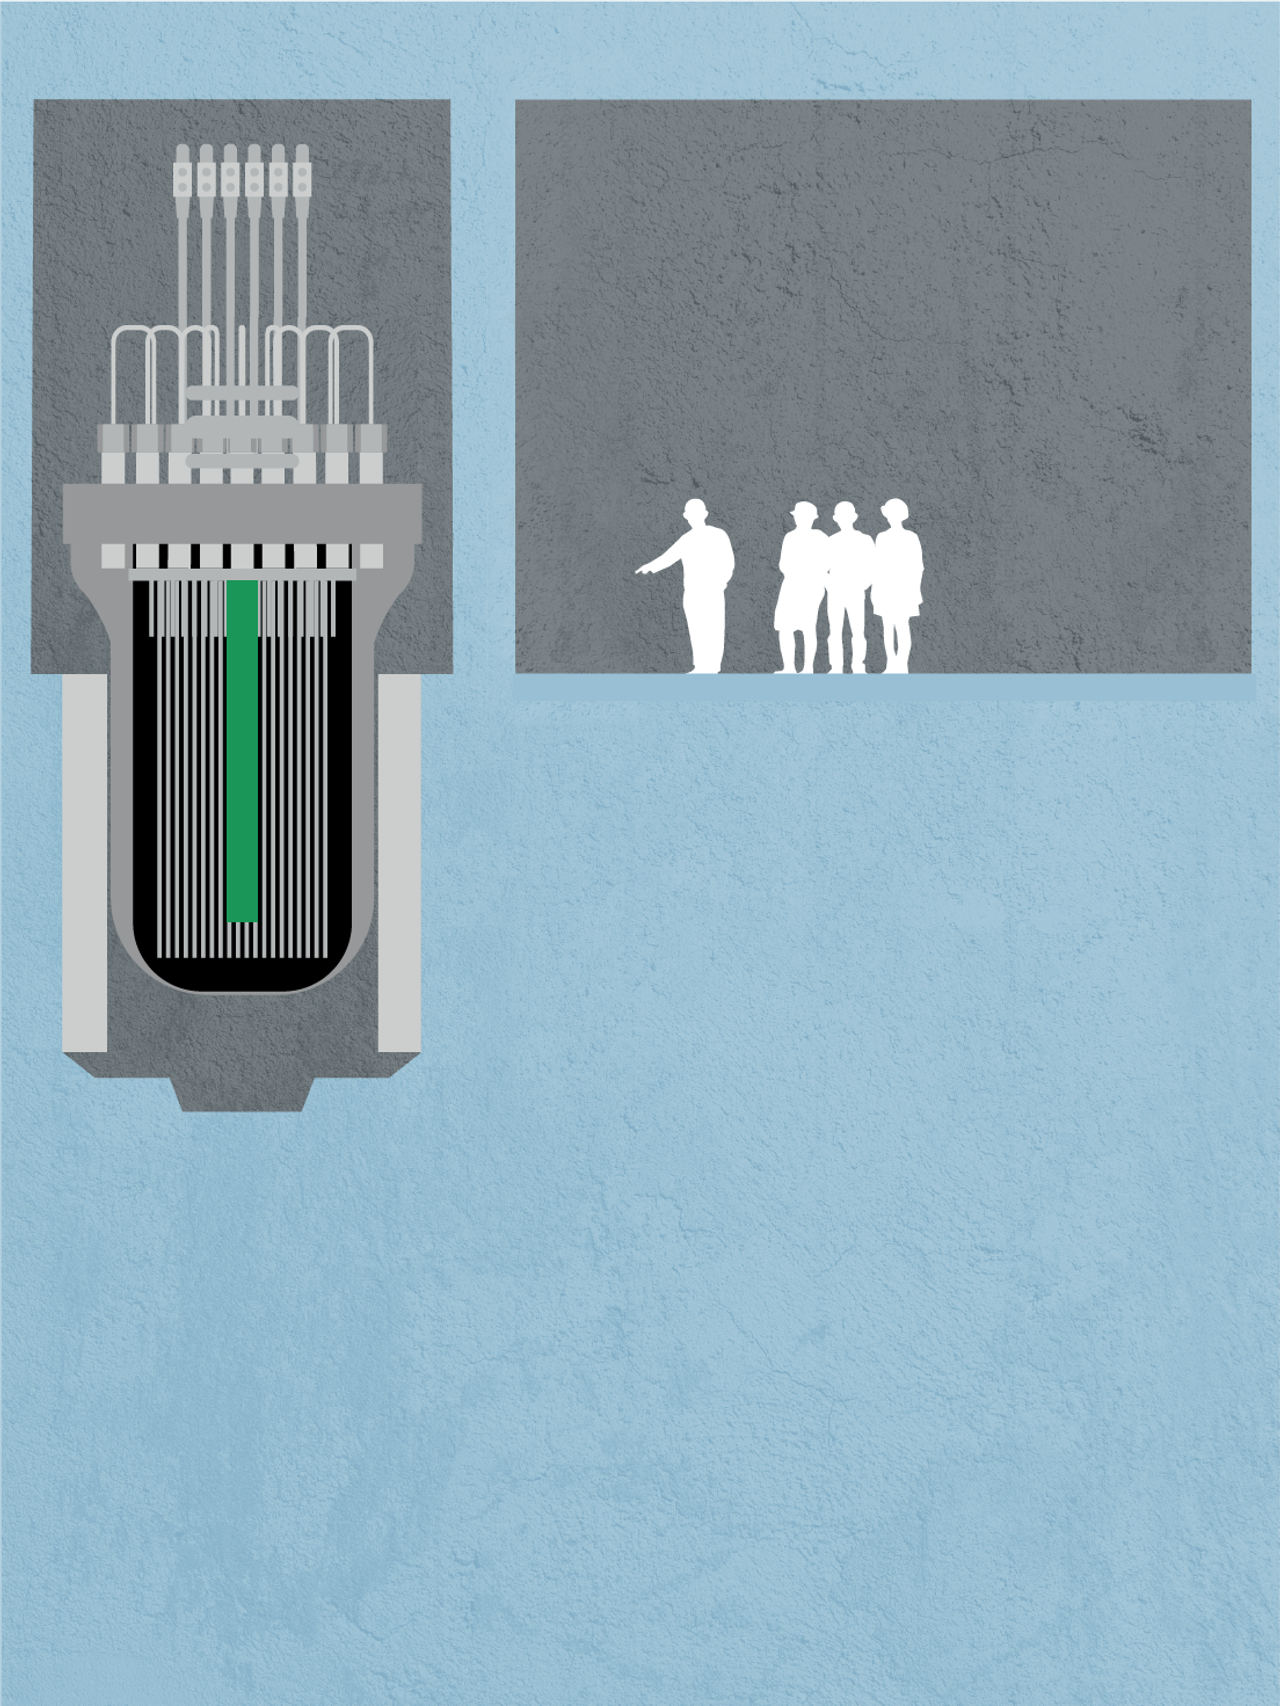 Atomreaktor illustrasjon del 1